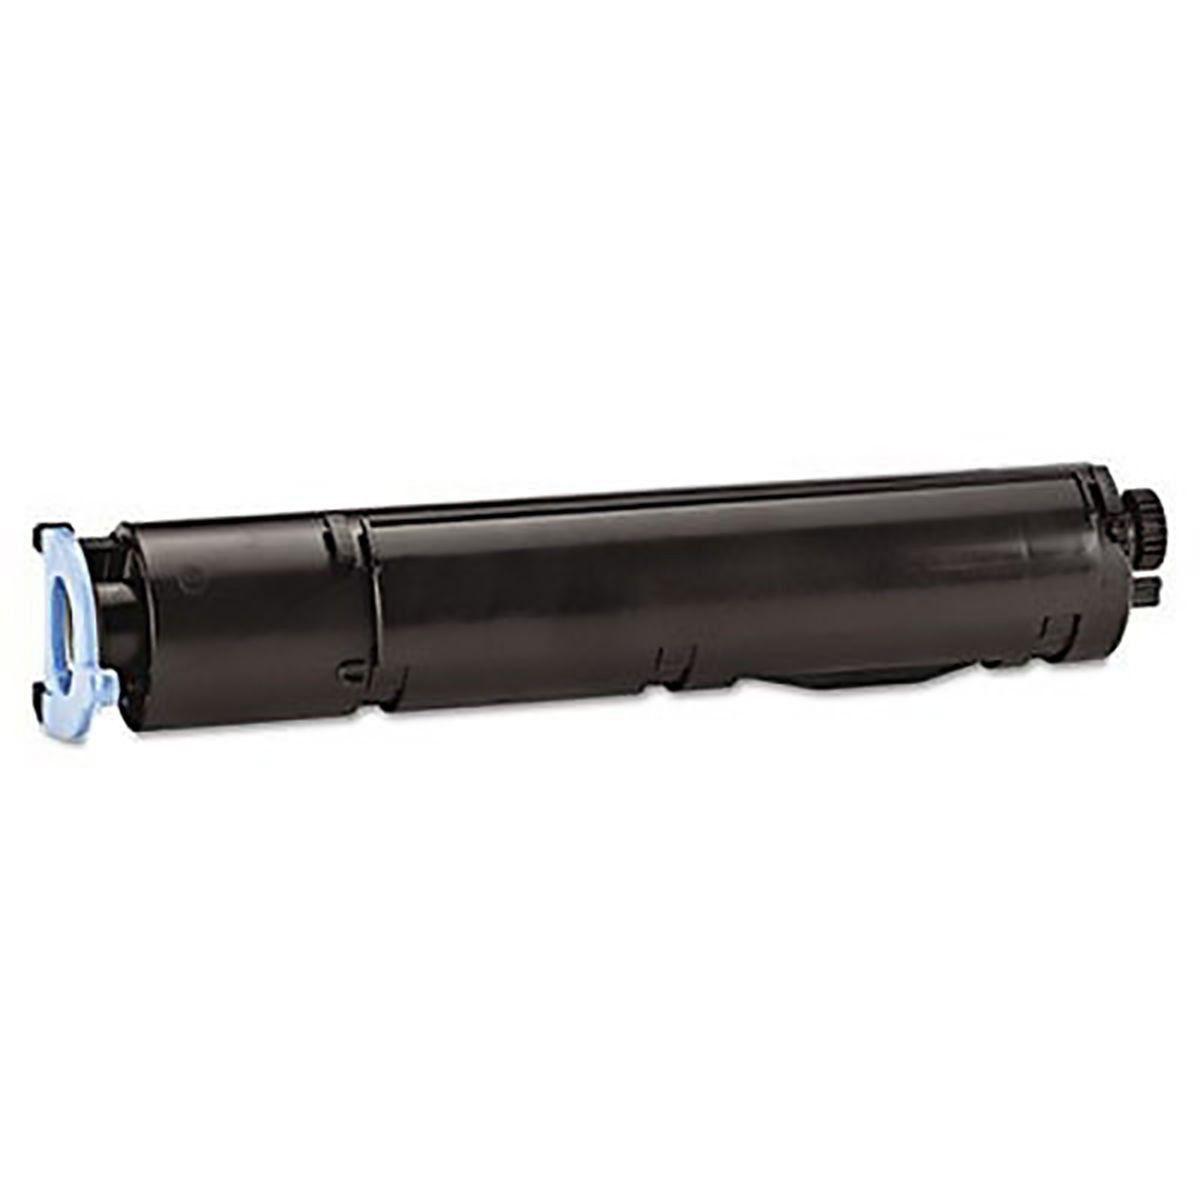 Compatível: Toner GPR22 para Canon ImageRunner IR-1023 IR1019j IR1022 IR1025if IR1023 IR-1023n IR-1025 / Preto / 8.400